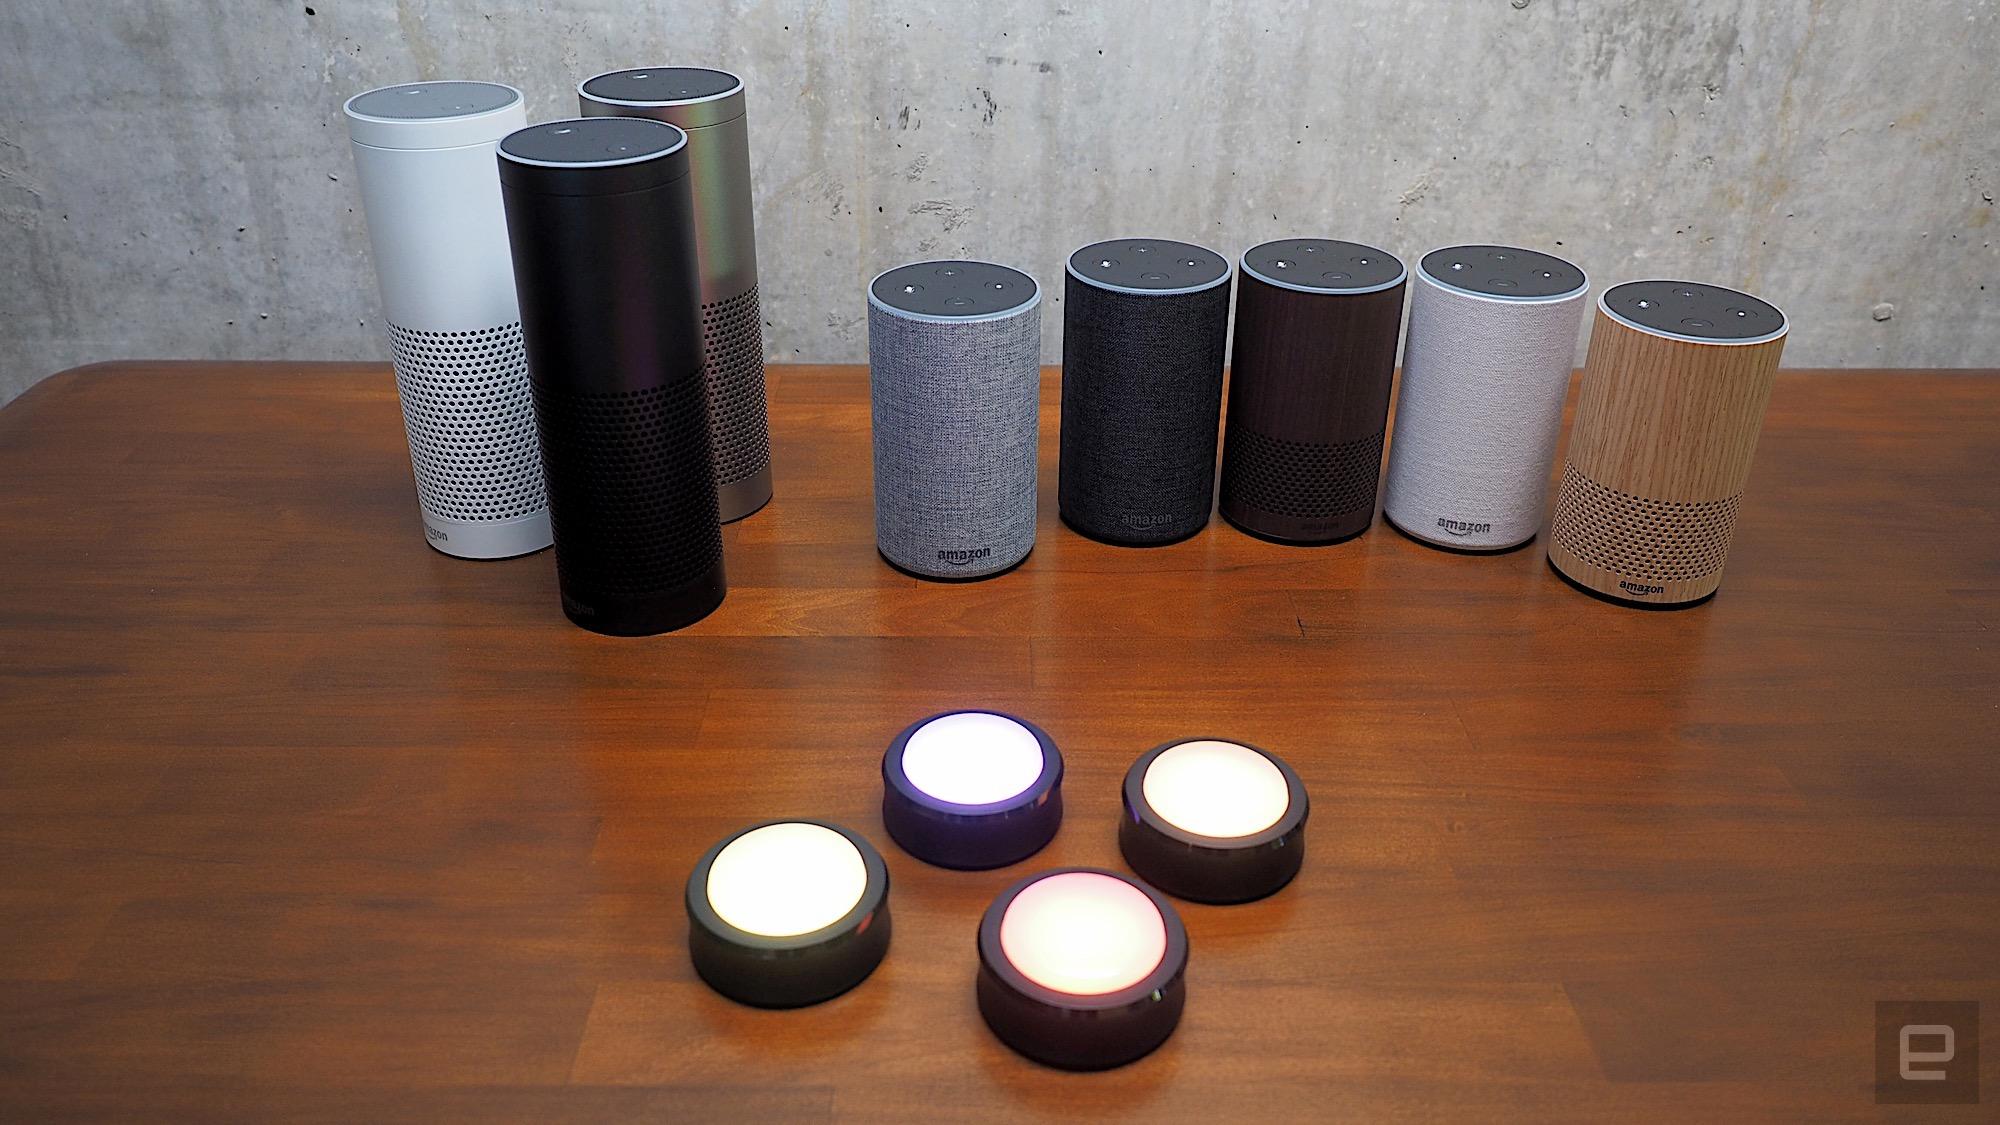 Amazon S New Echo Designs Bring Alexa In All Sizes